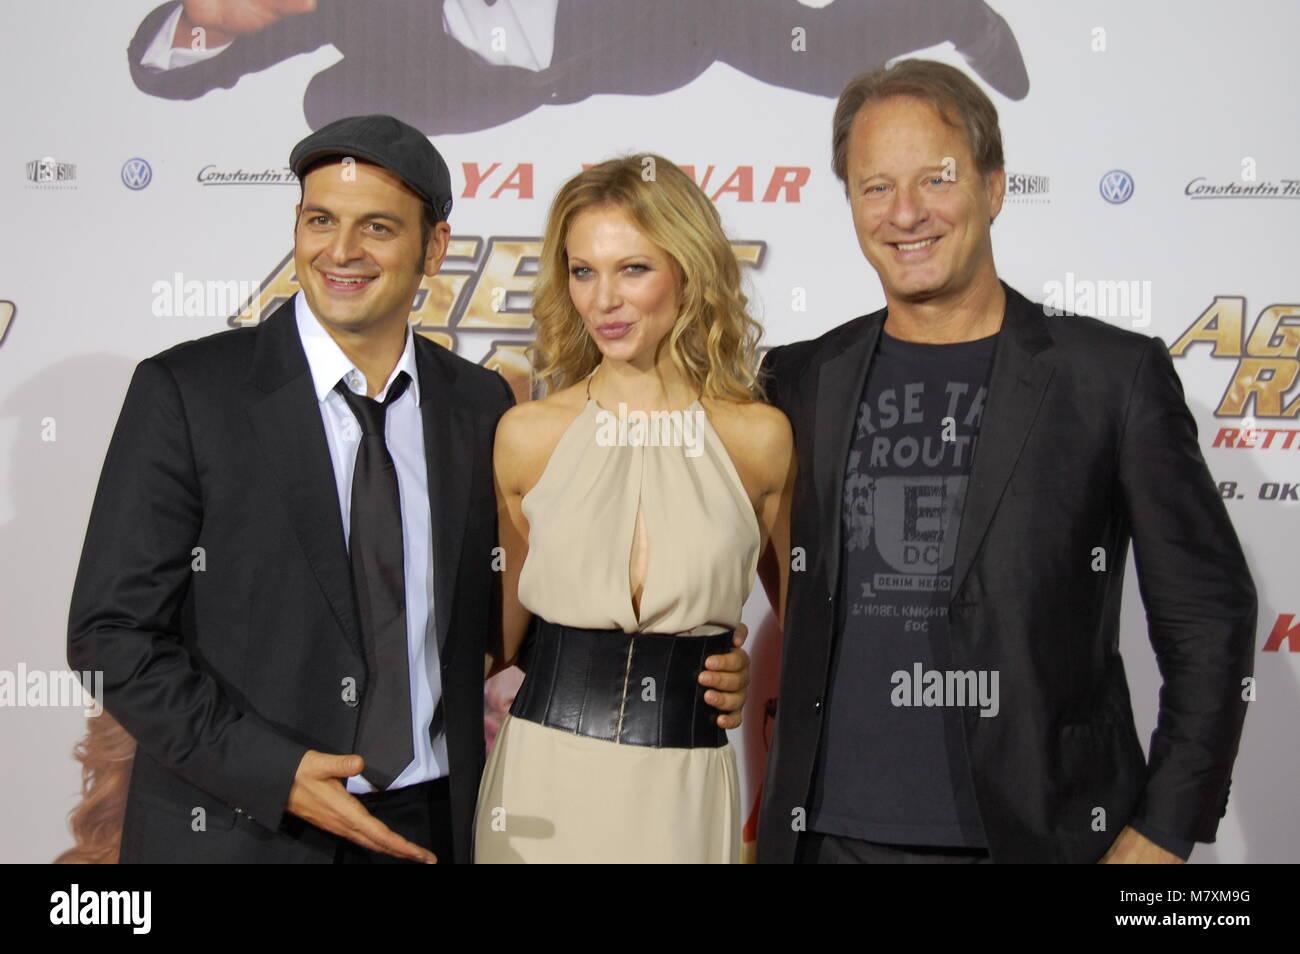 Kaya Yanar, Birte Glang, Tom Gerhardt attend the 'Agent Ranjid' Germany Premiere on October 17, 2012 in Cologne, Stock Photo